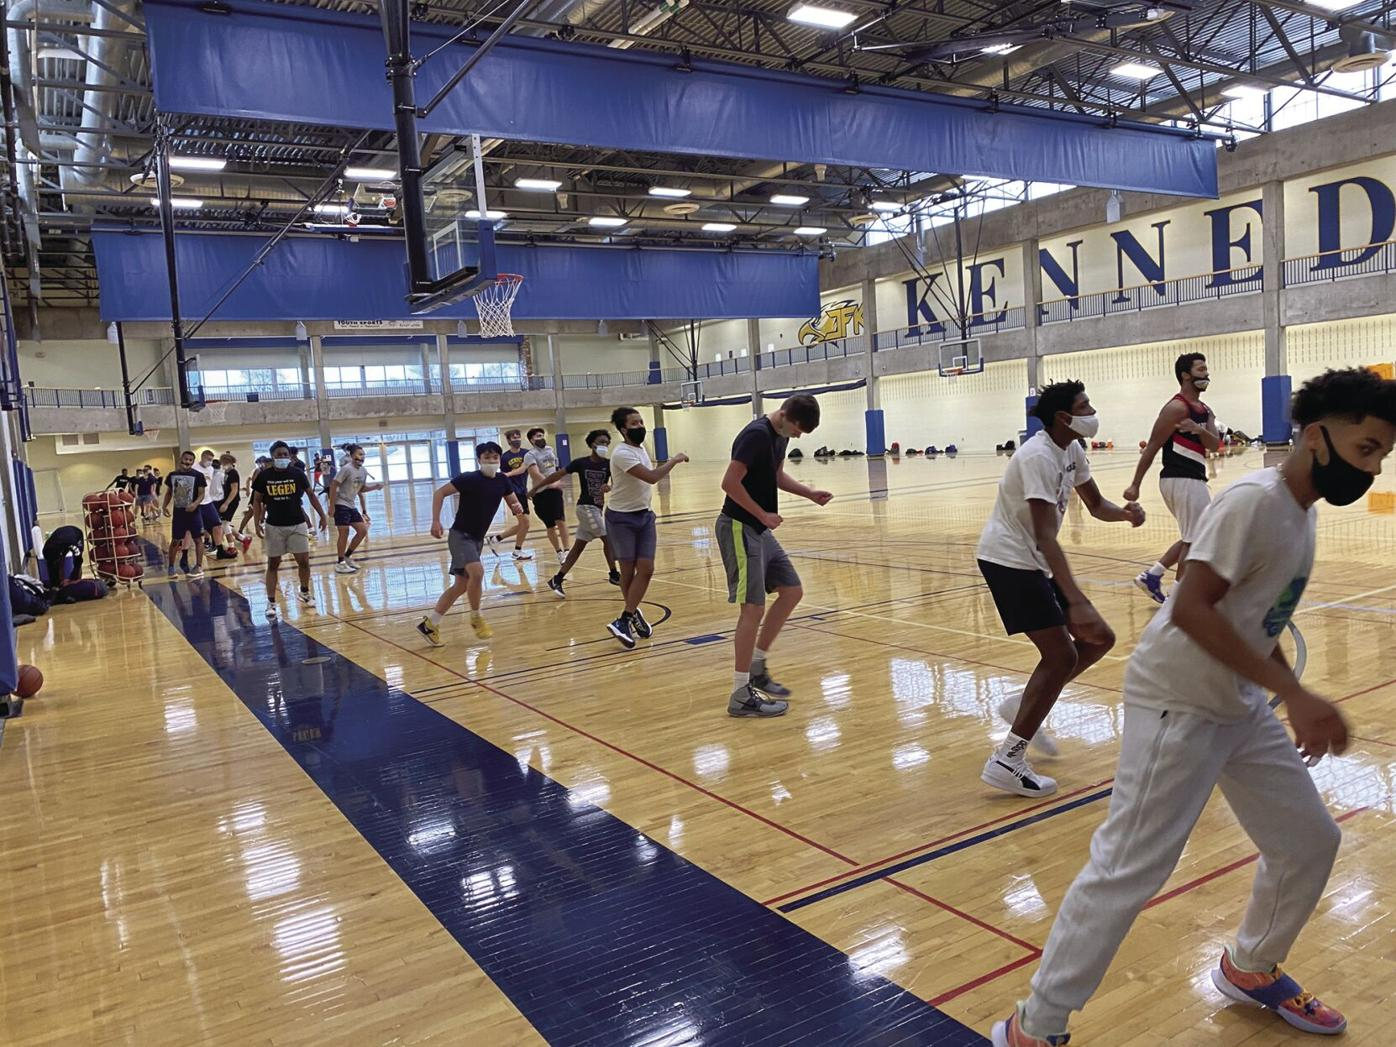 Kennedy basketball